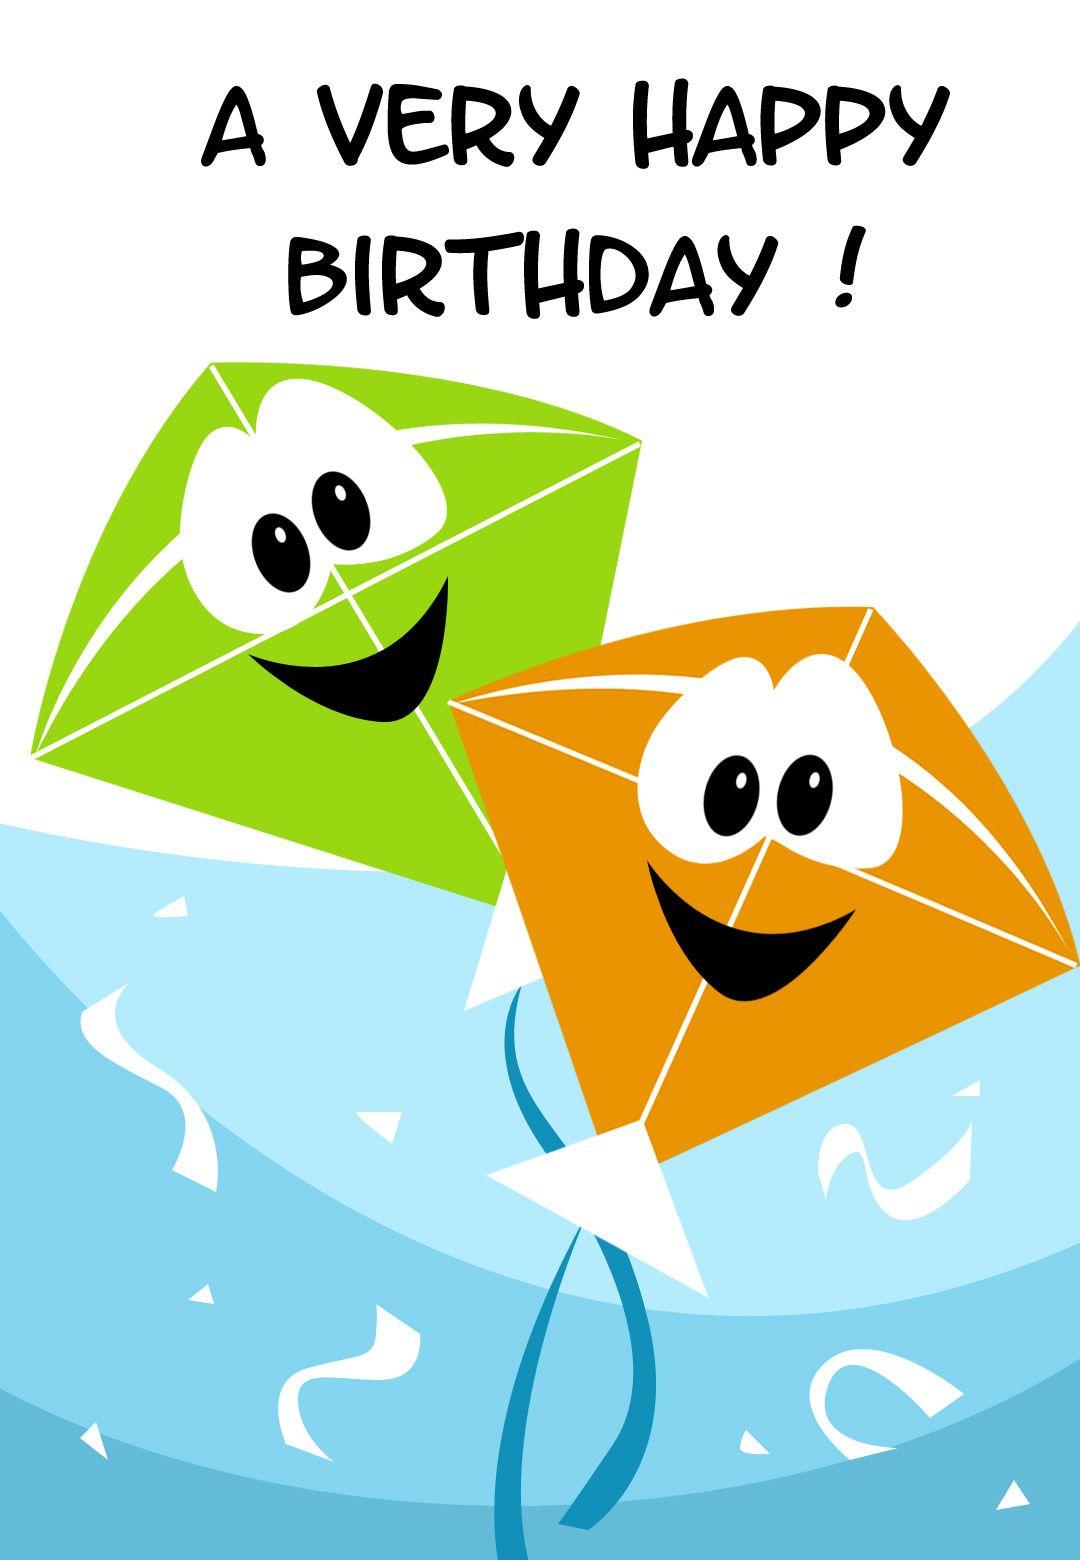 Pin By Lauren Kinney On Birthday Happy Birthday Cards Free Happy Birthday Cards Happy Birthday Greetings